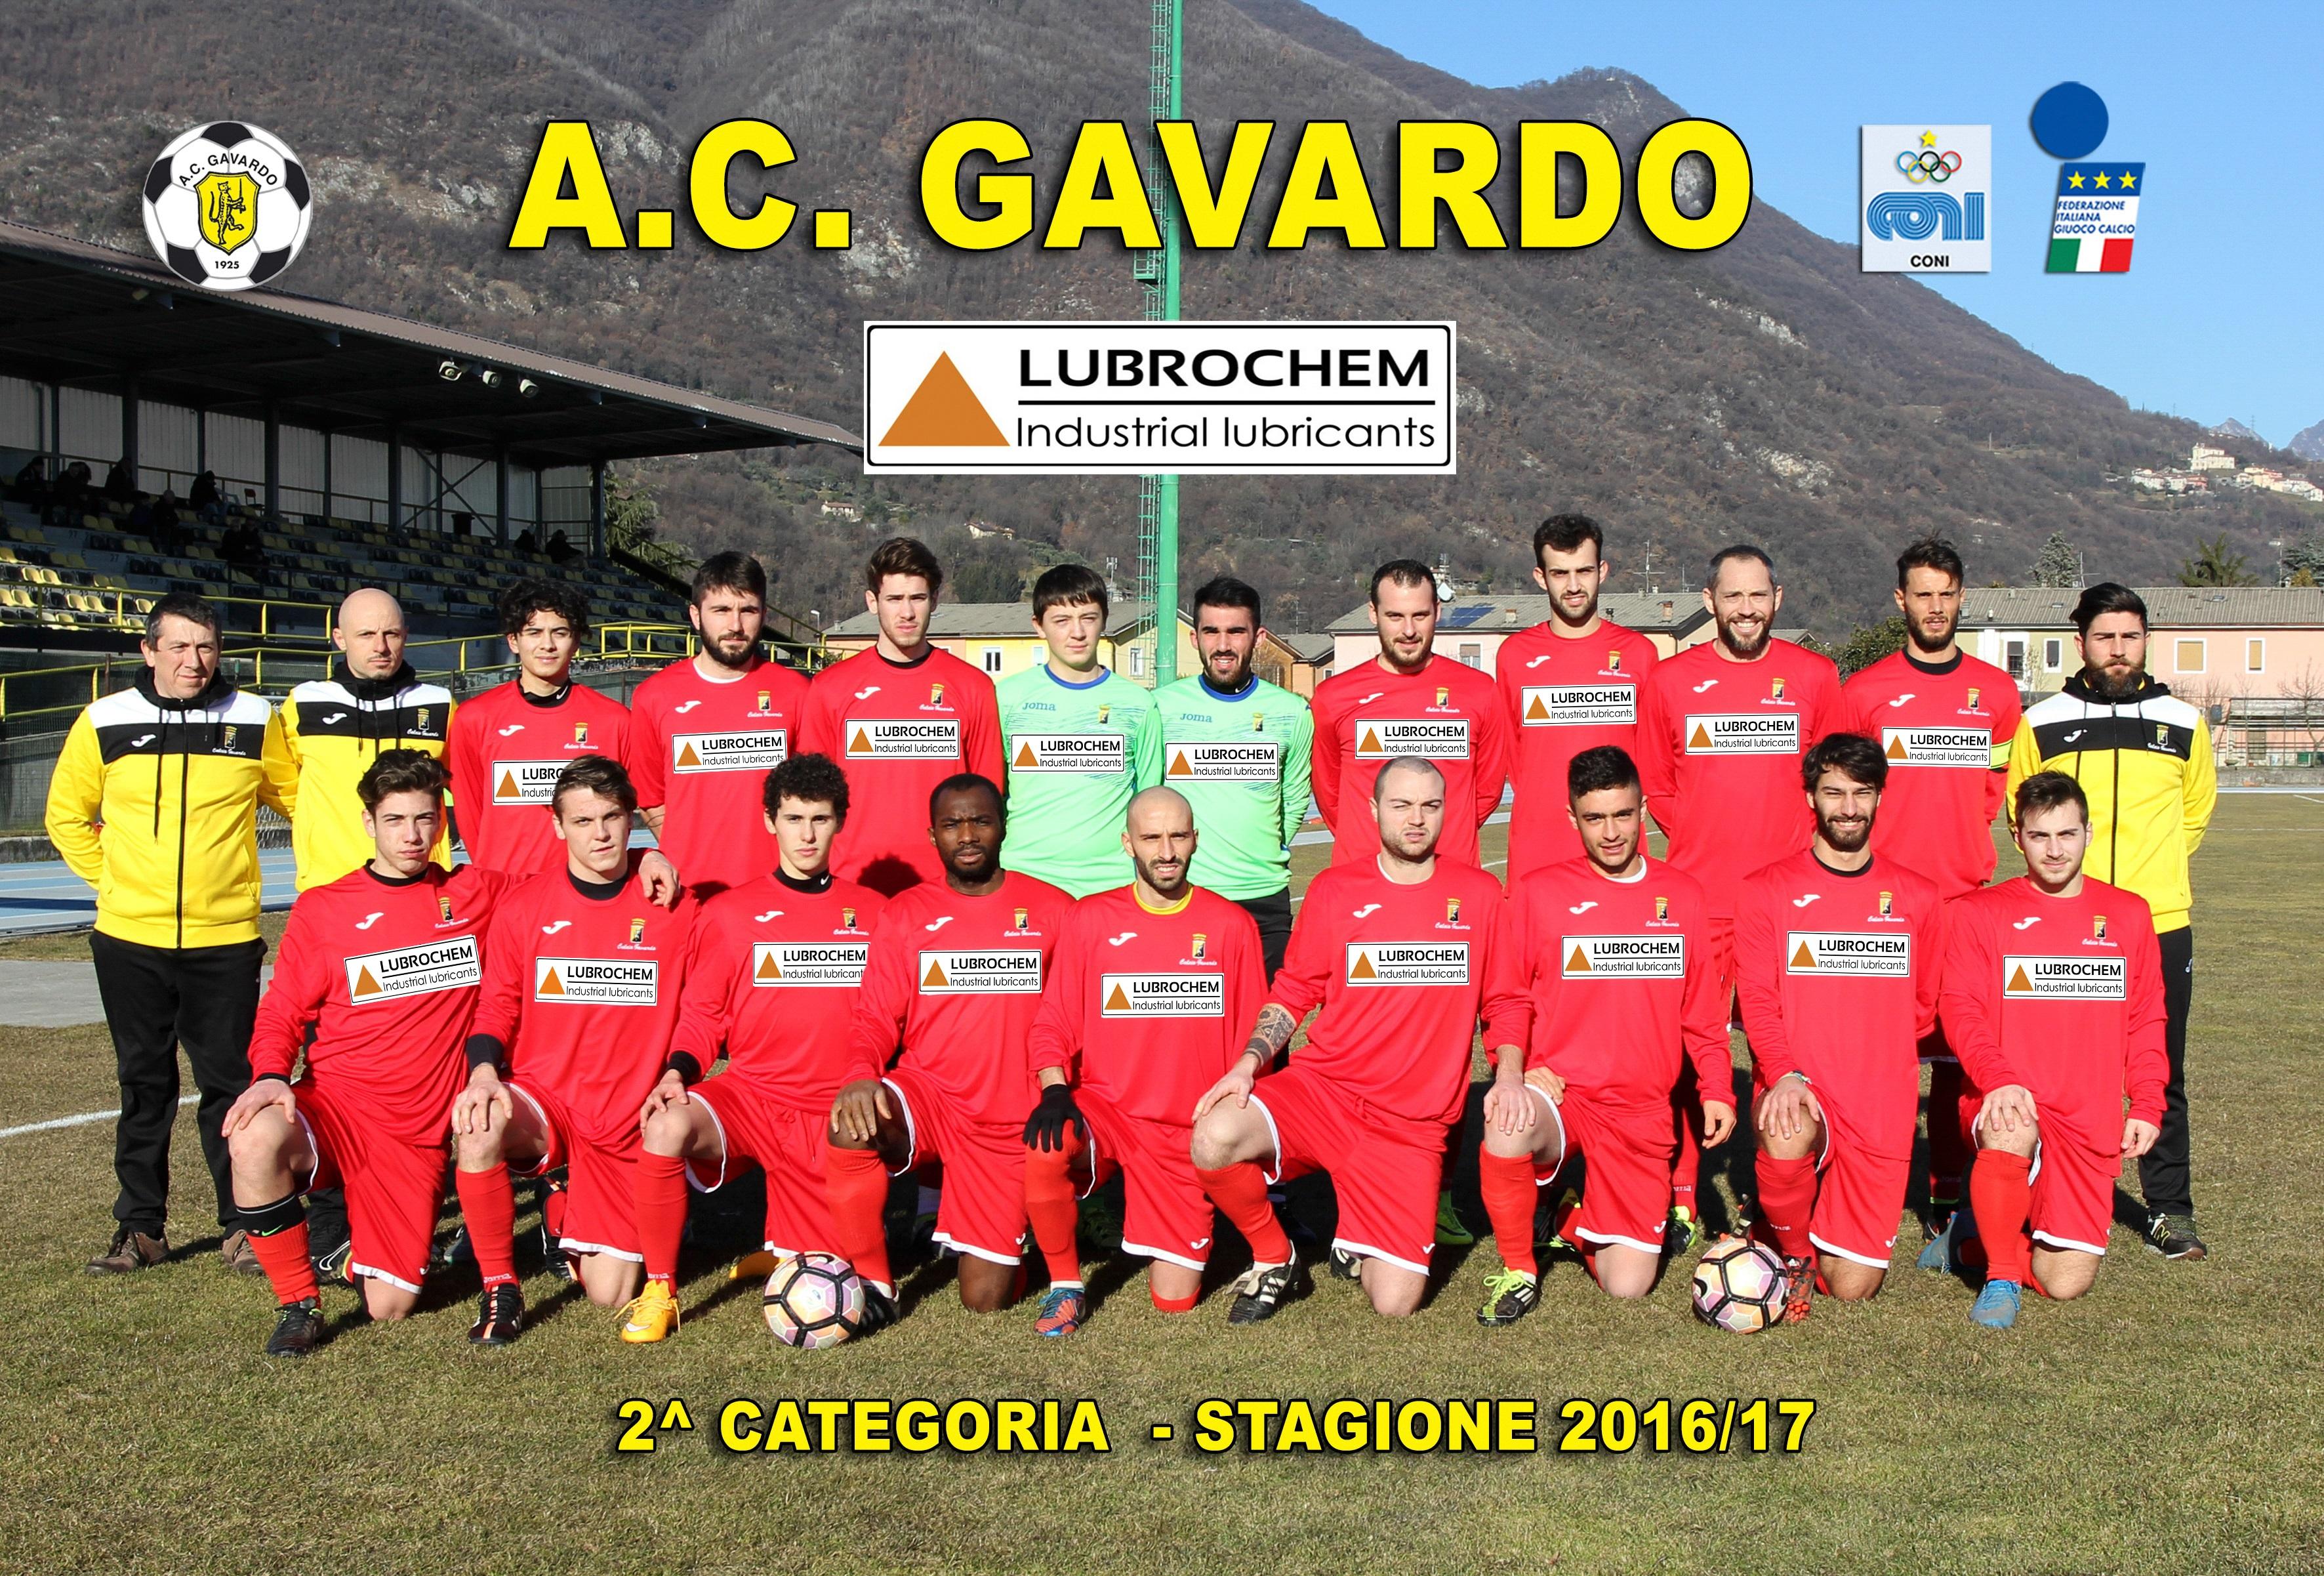 Calcio Gavardo Lubrochem 2017